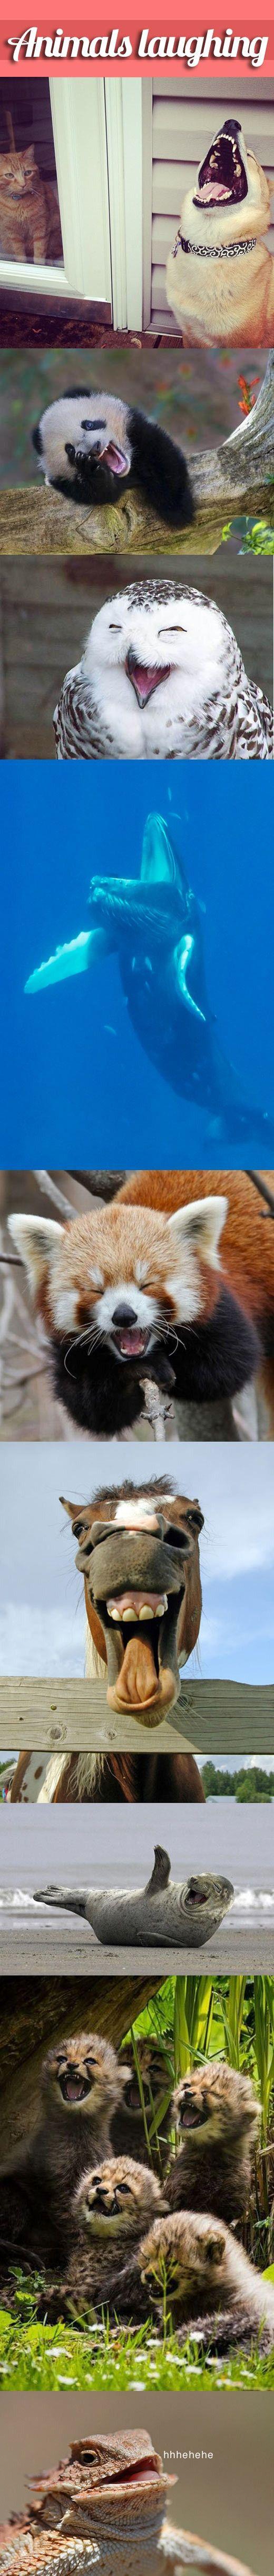 Animals laughing - Imgur